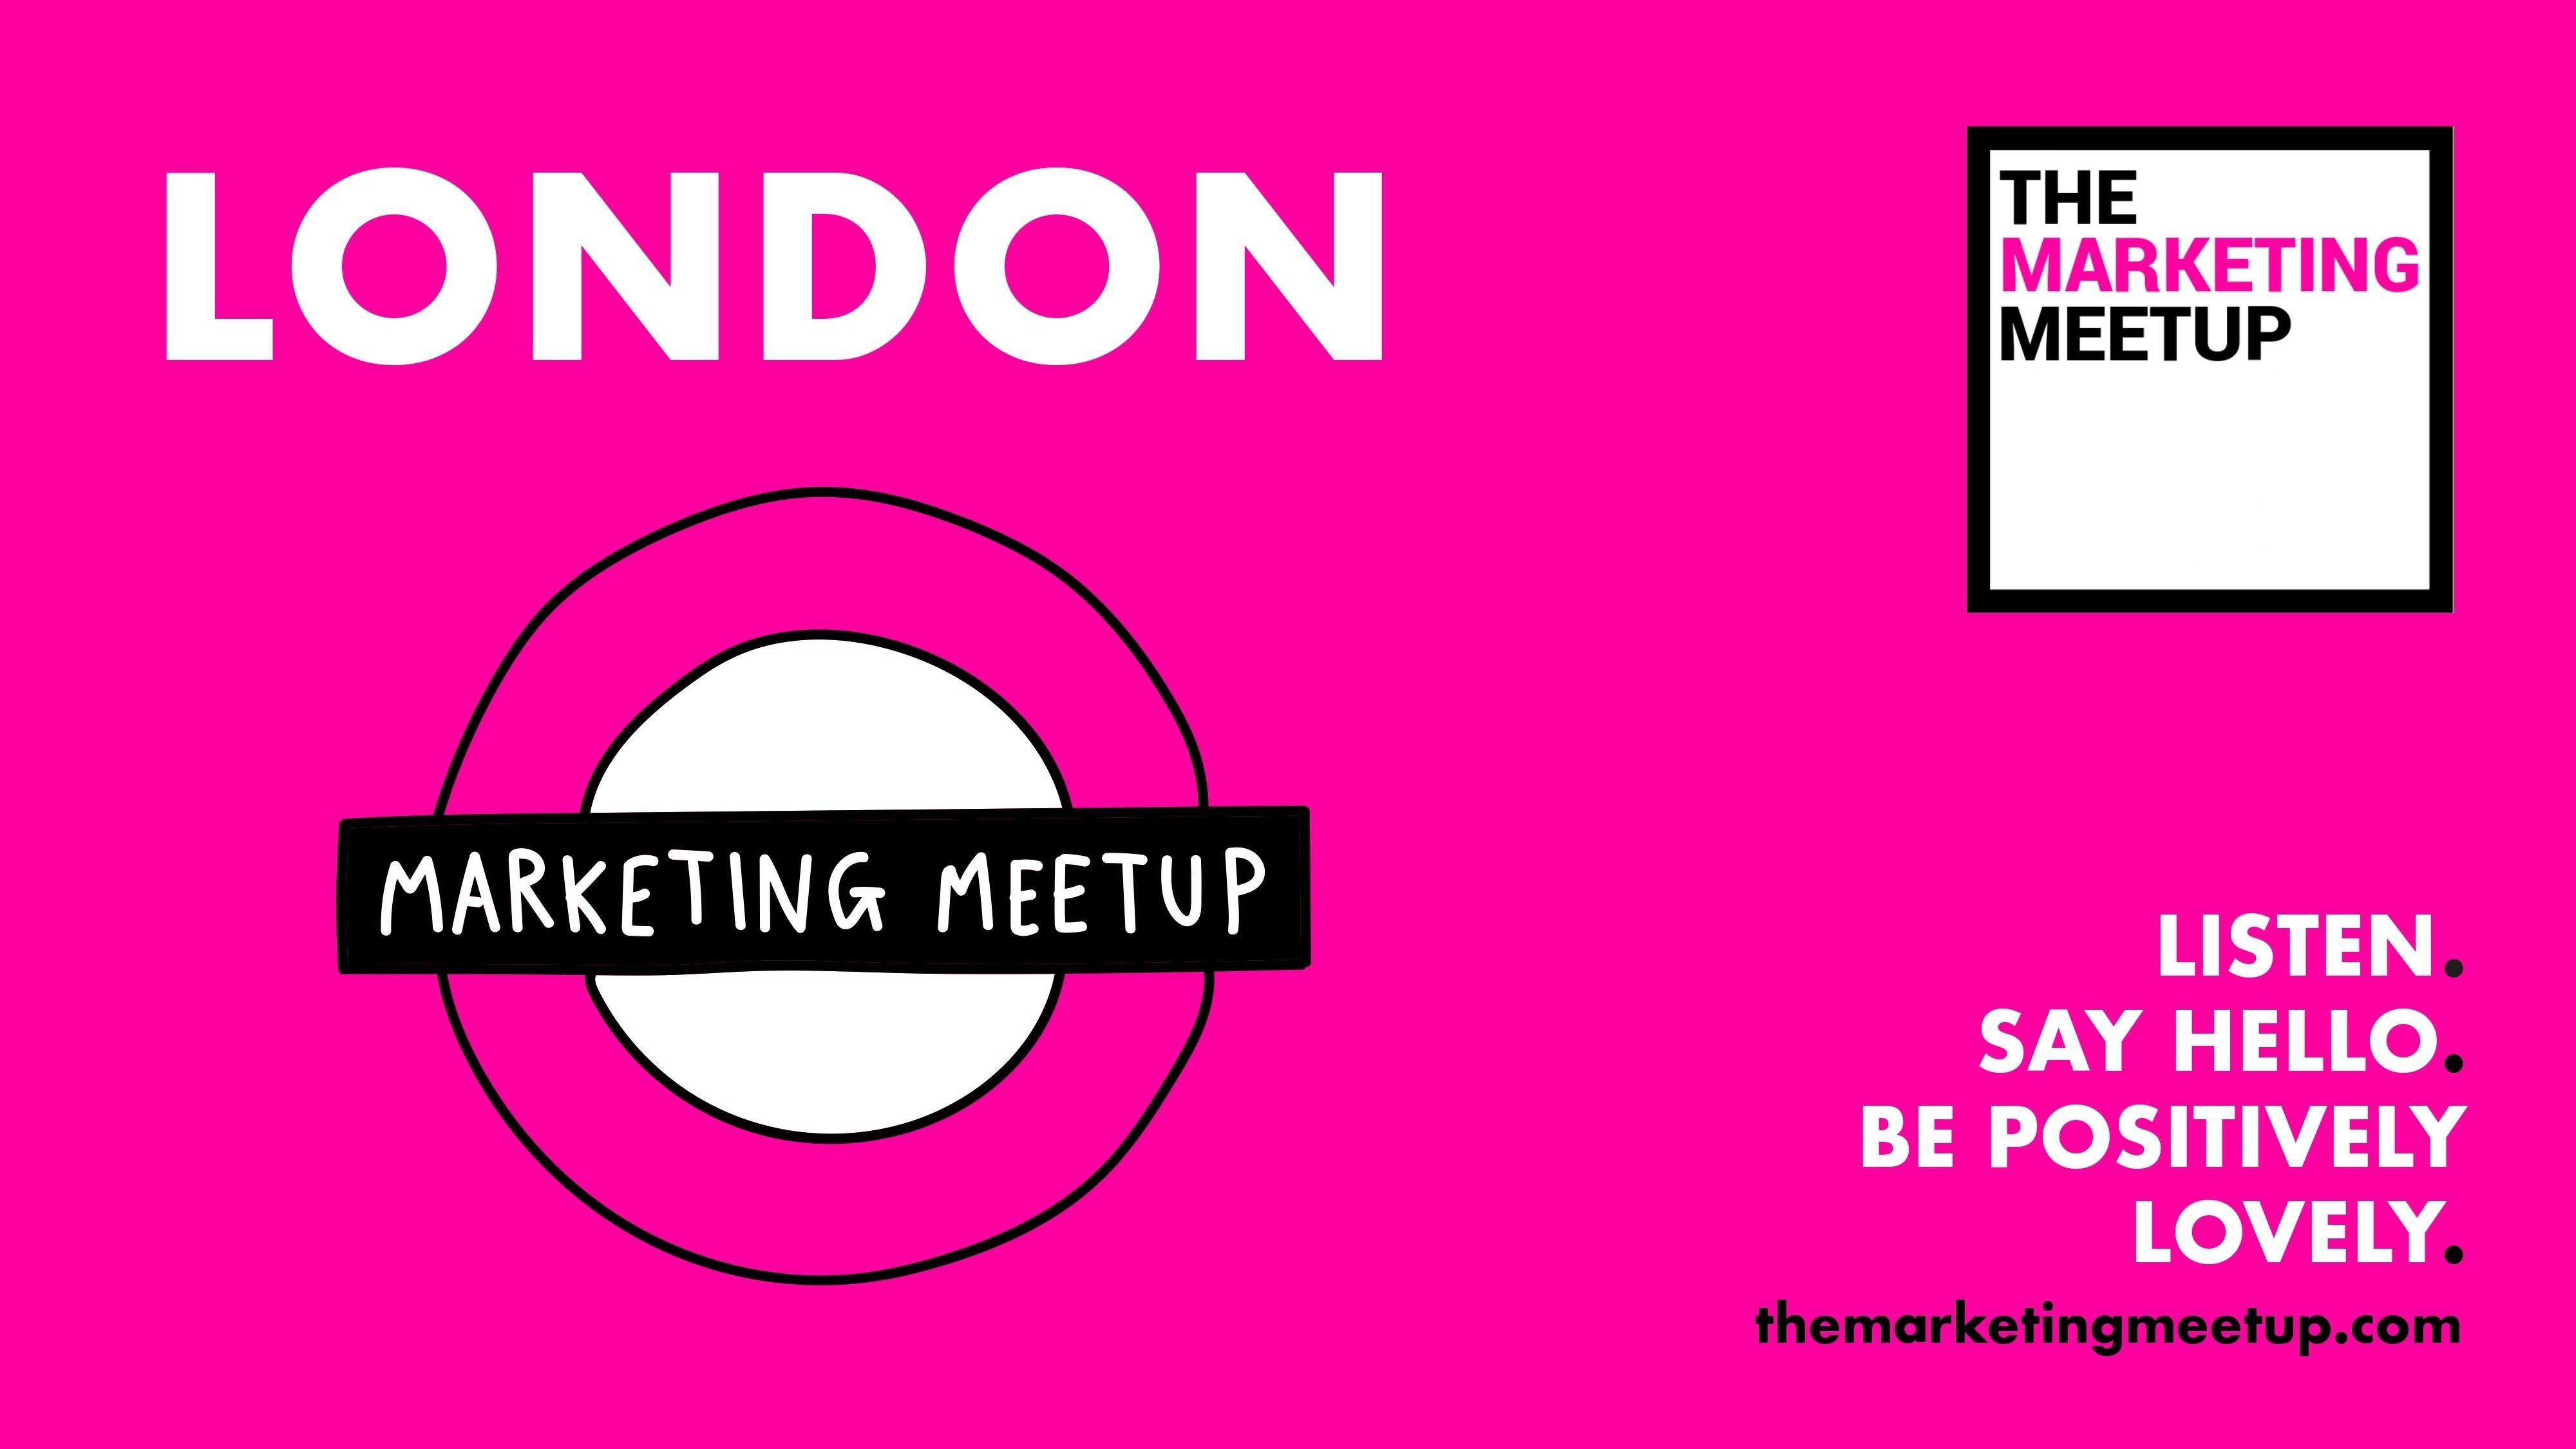 The Marketing Meetup: London